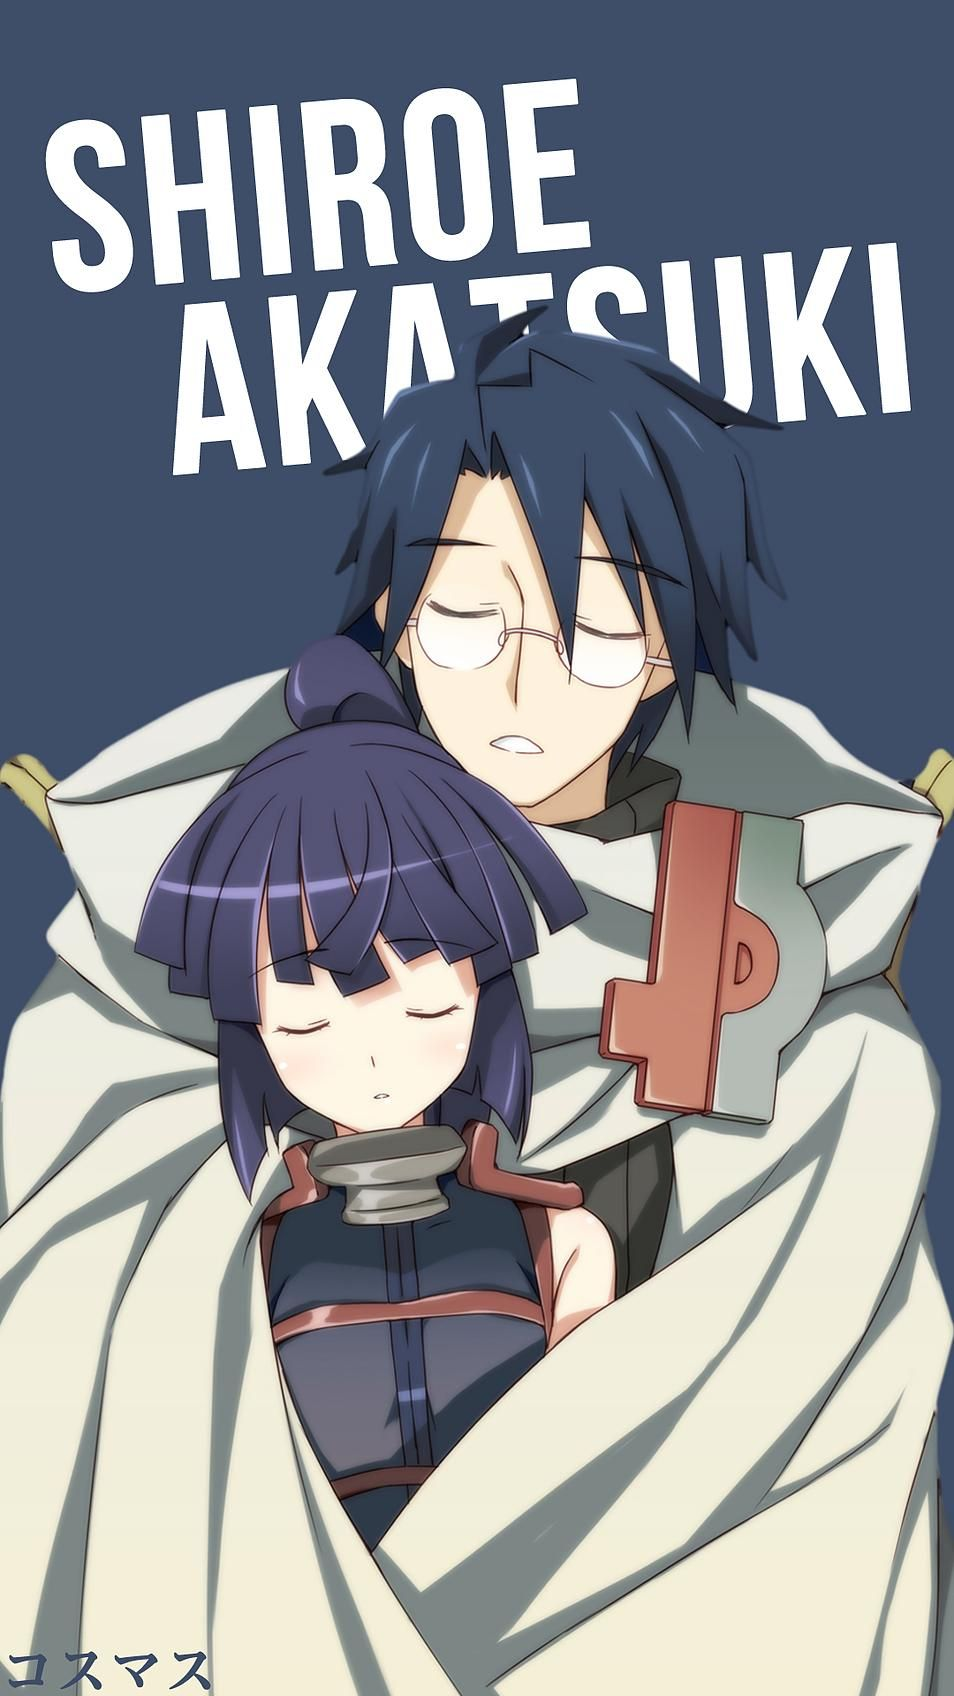 Shiroe x Akatsuki Korigengi Wallpaper Anime Anime